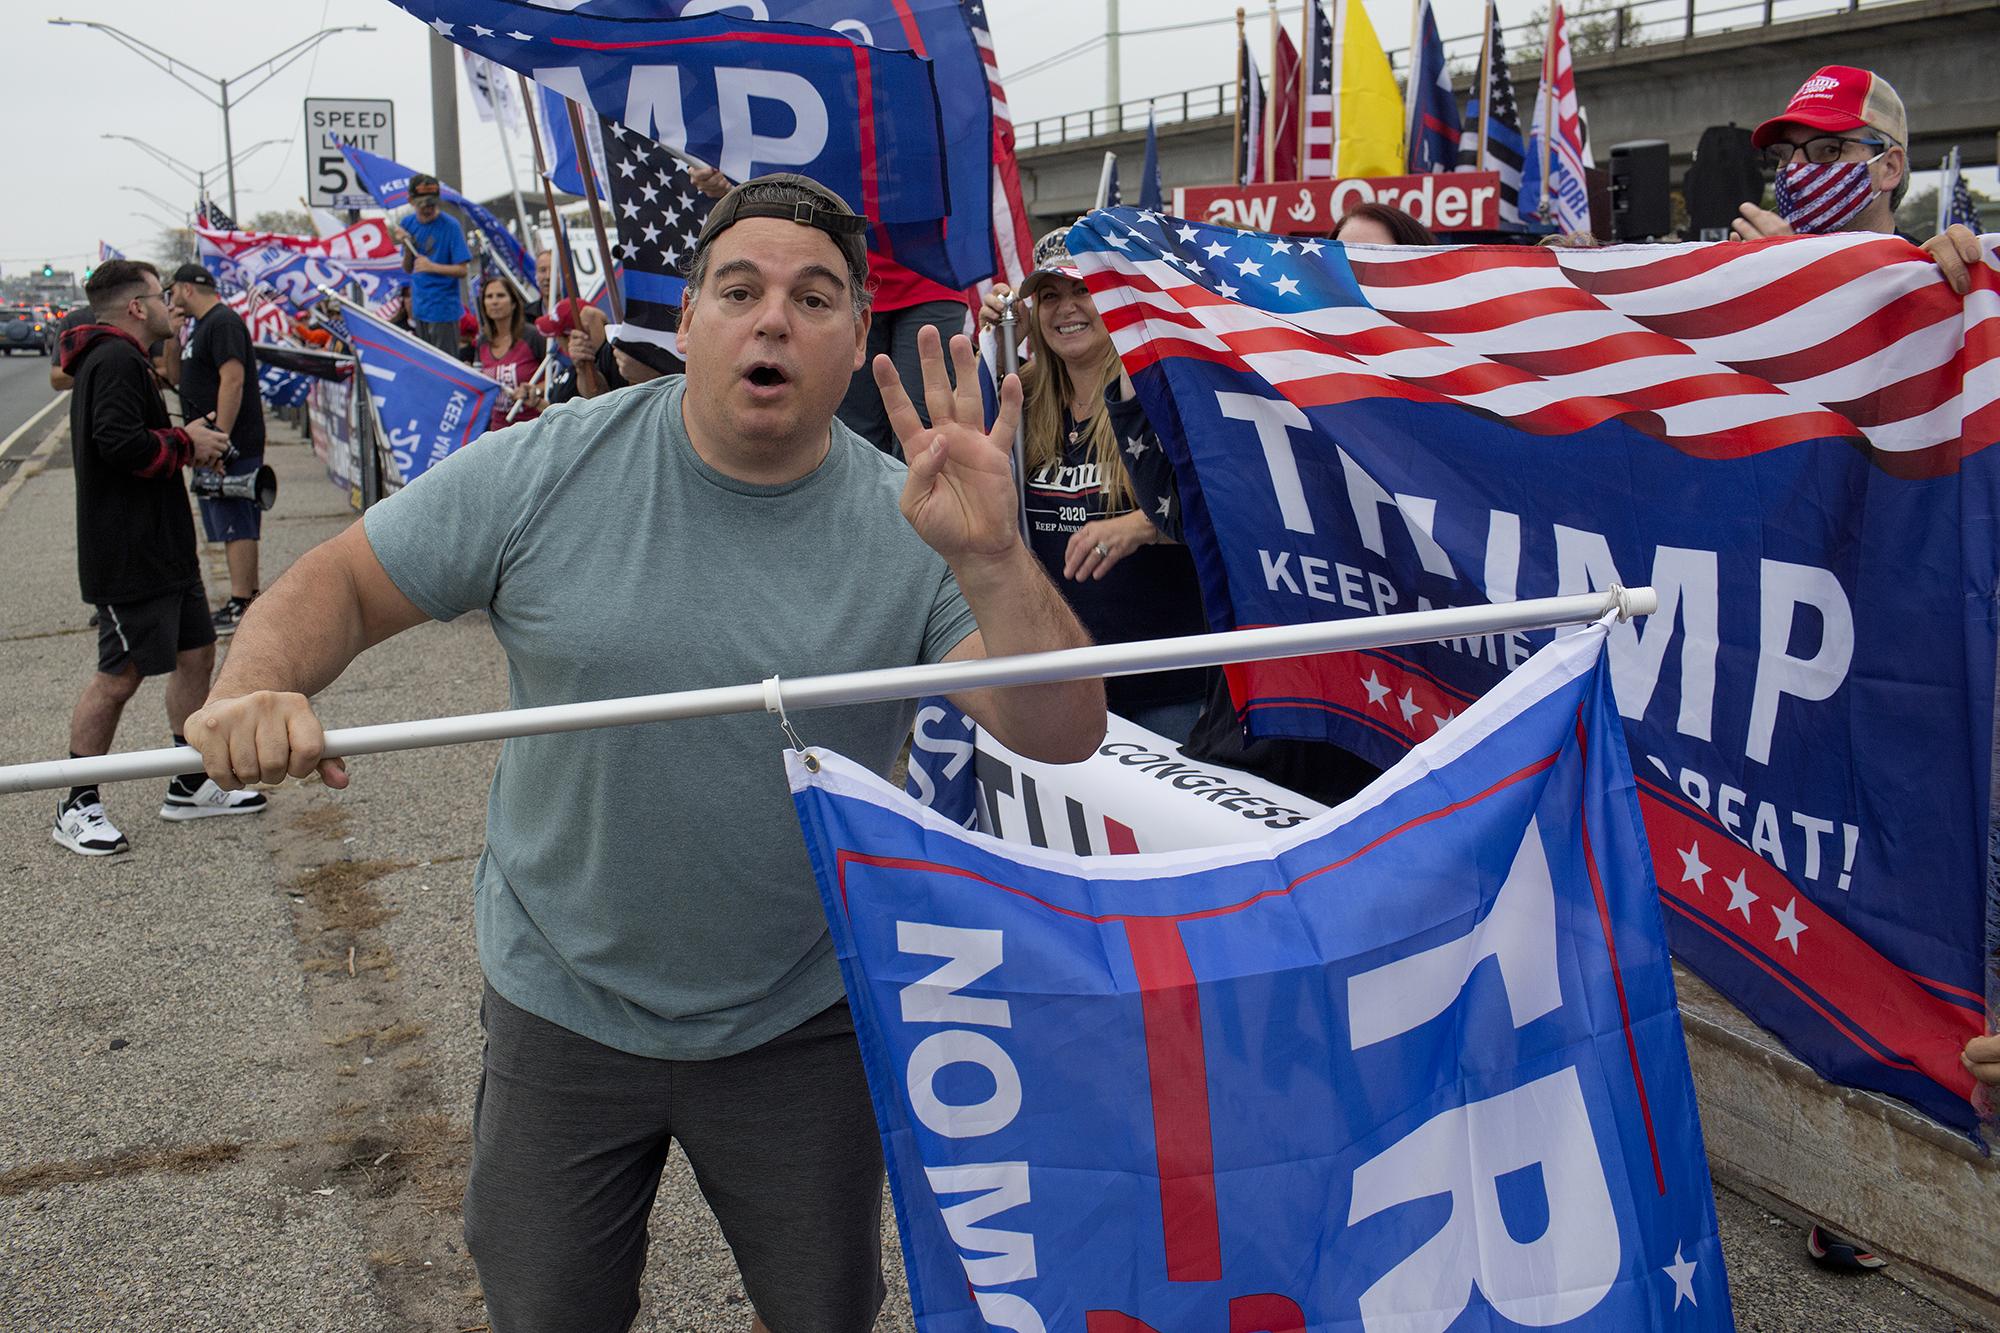 Trump supporters march a giant Trump flag through lower Manhattan